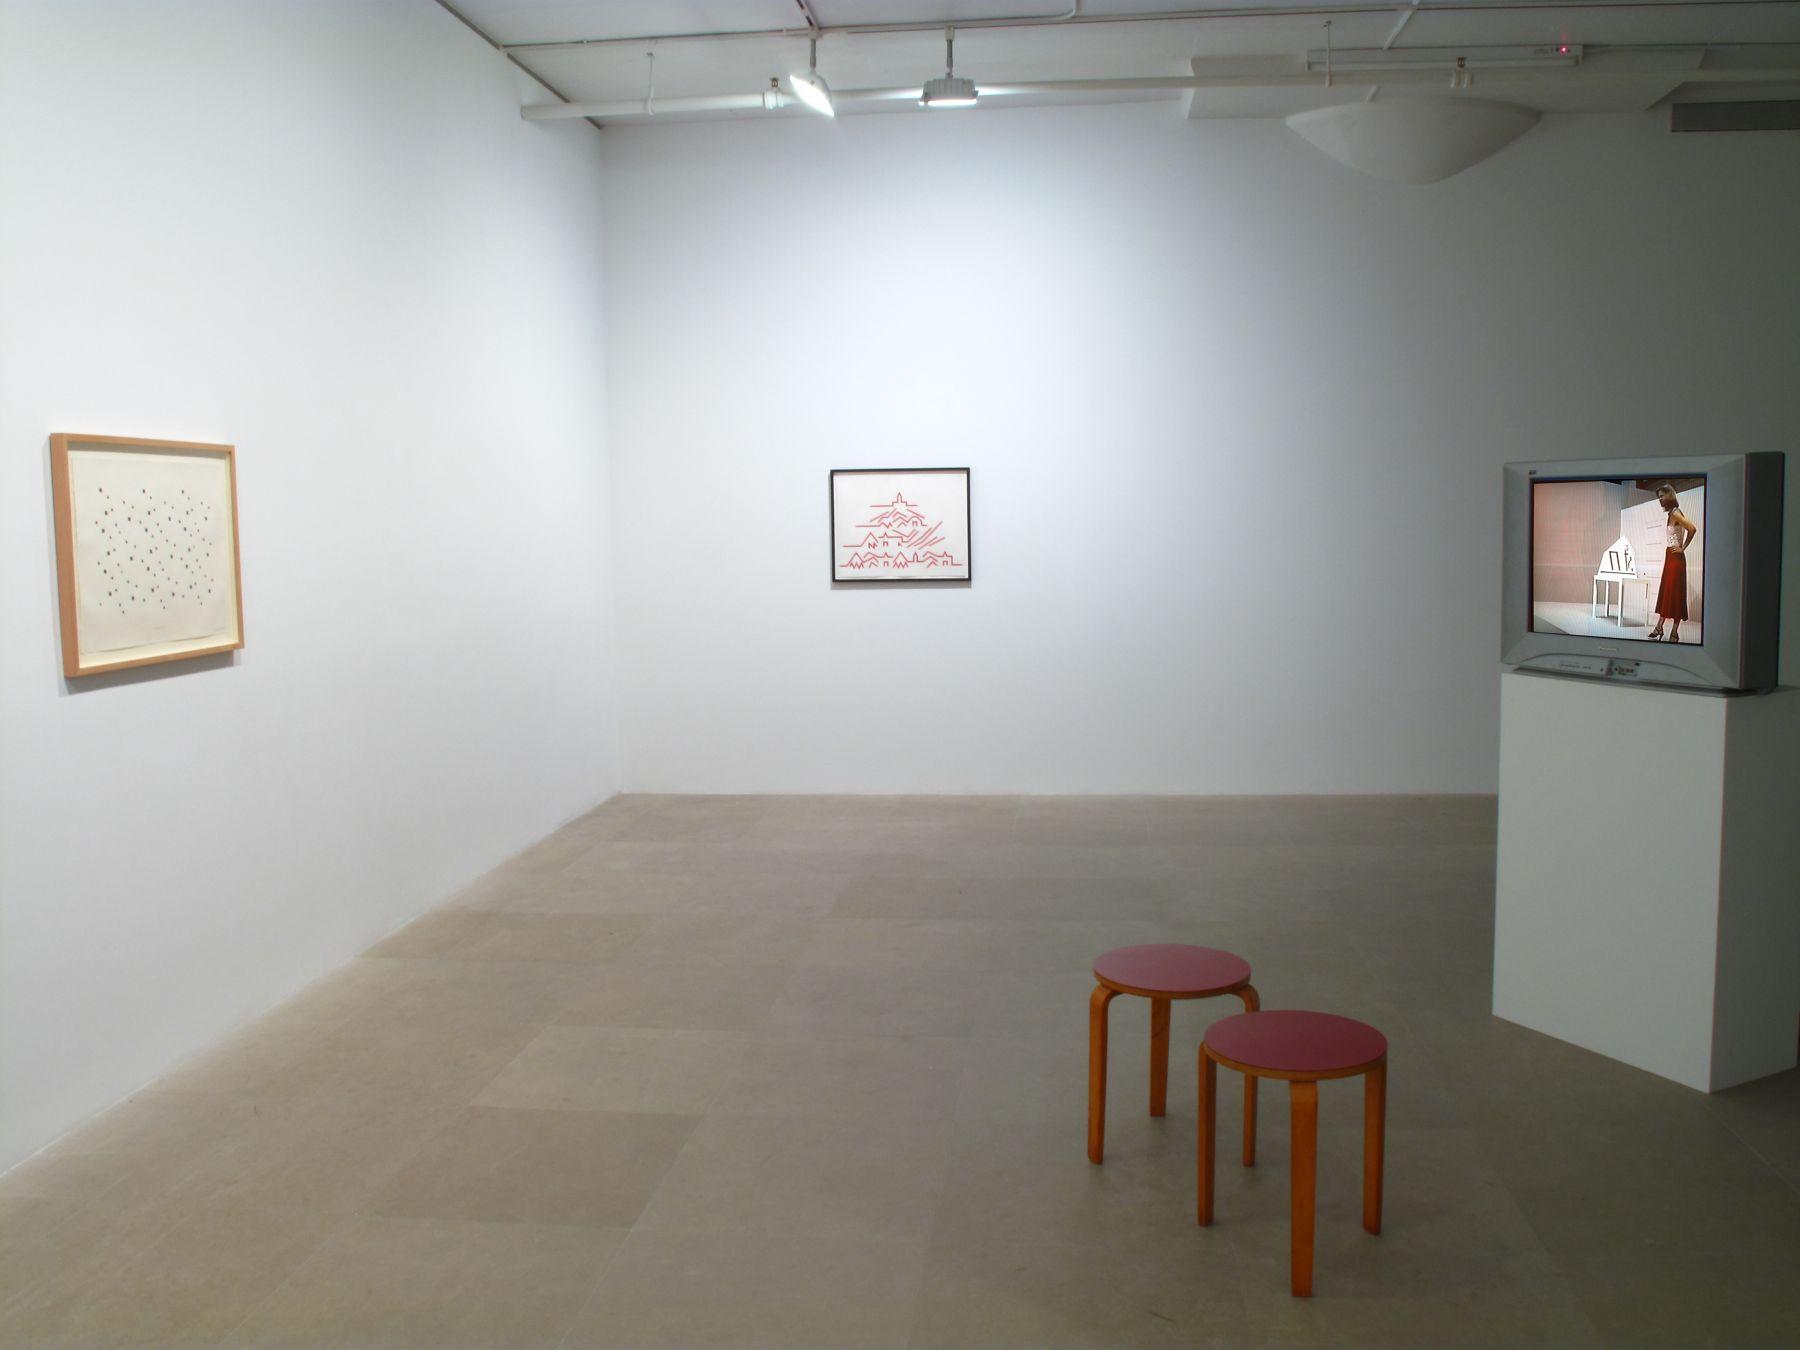 Installation view, Greene Naftali, New York, 2009